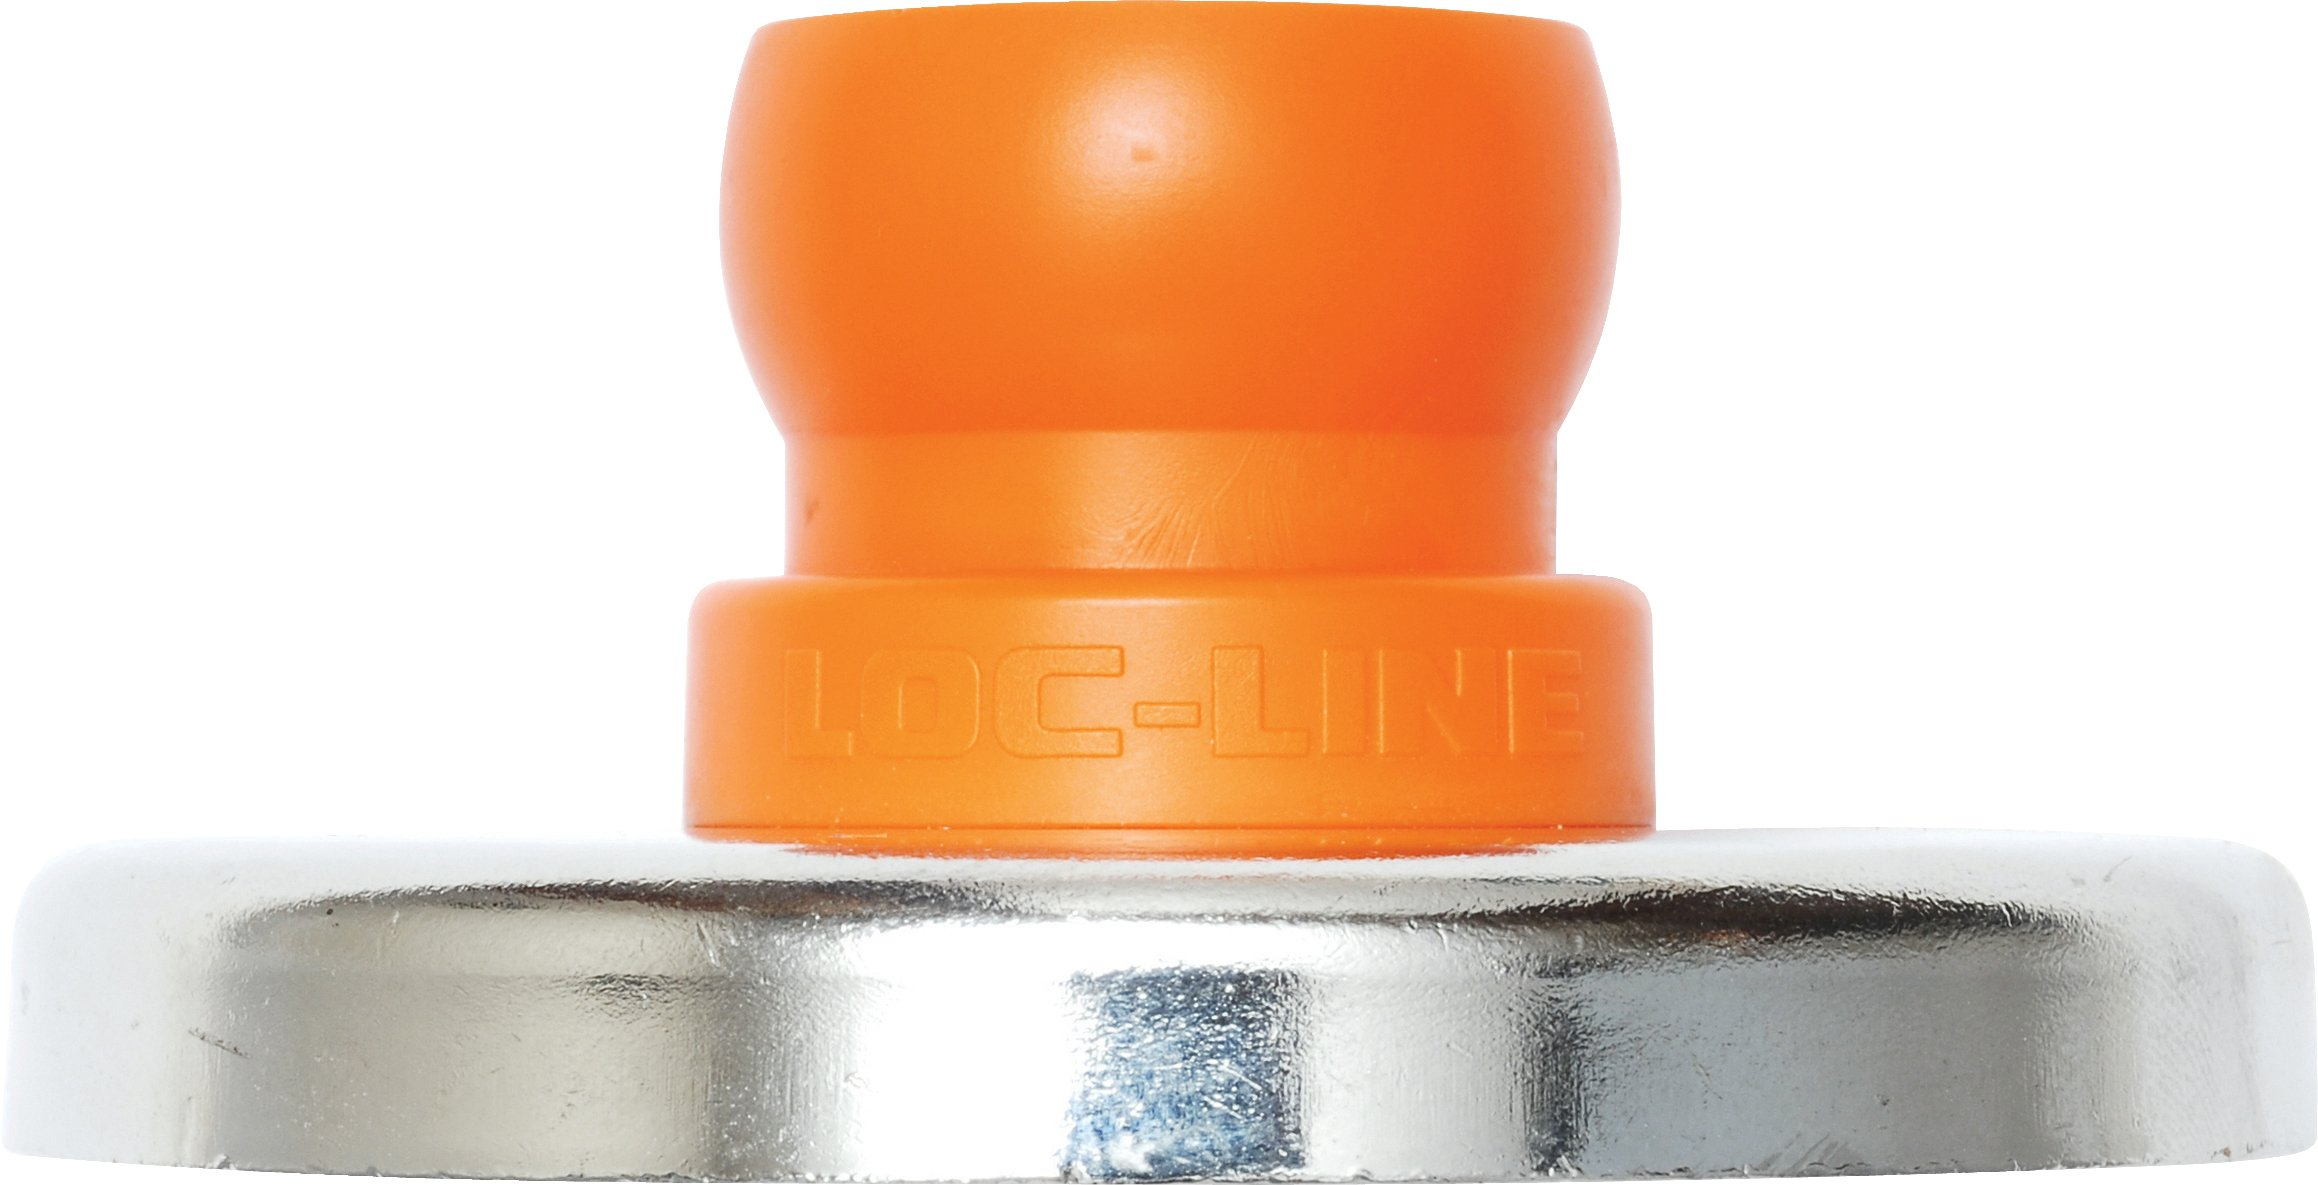 Loc-Line Coolant Hose Component, Acetal Copolymer, Magnetic Base, 3/4'' Hose ID by Loc-Line